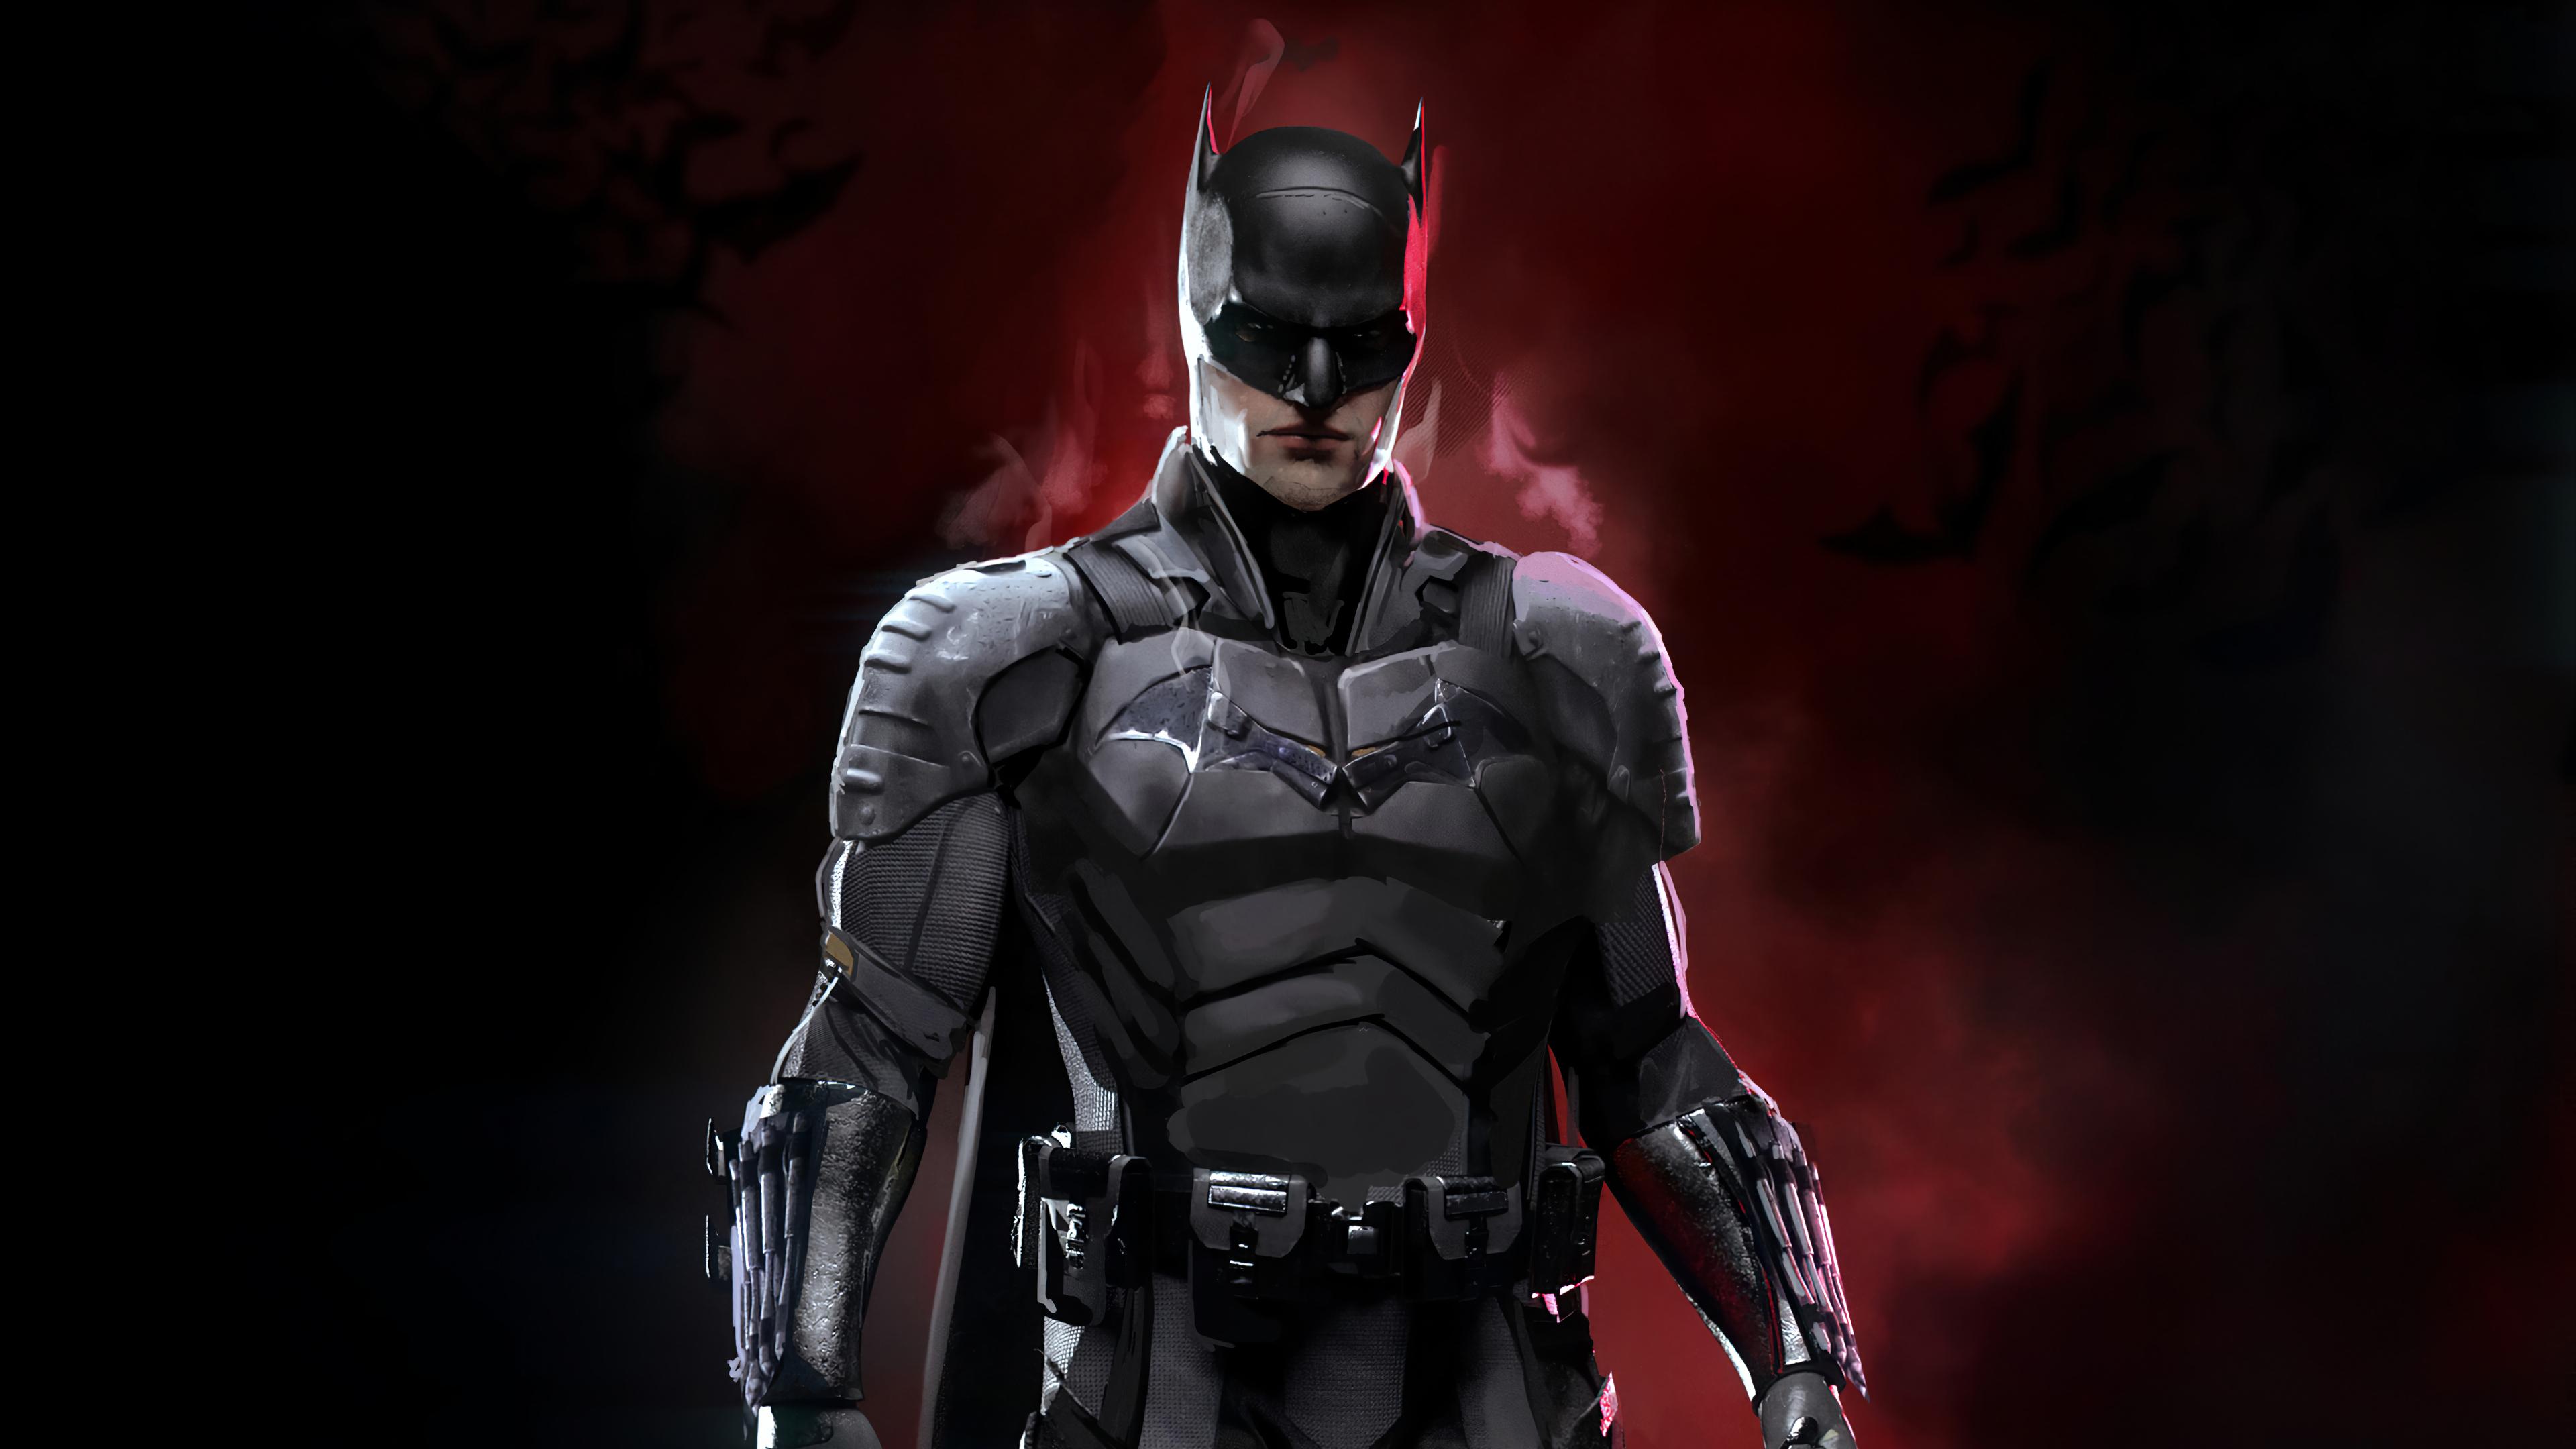 The Batman 2021 Robert Pattinson 4K Wallpaper 32587 3840x2160